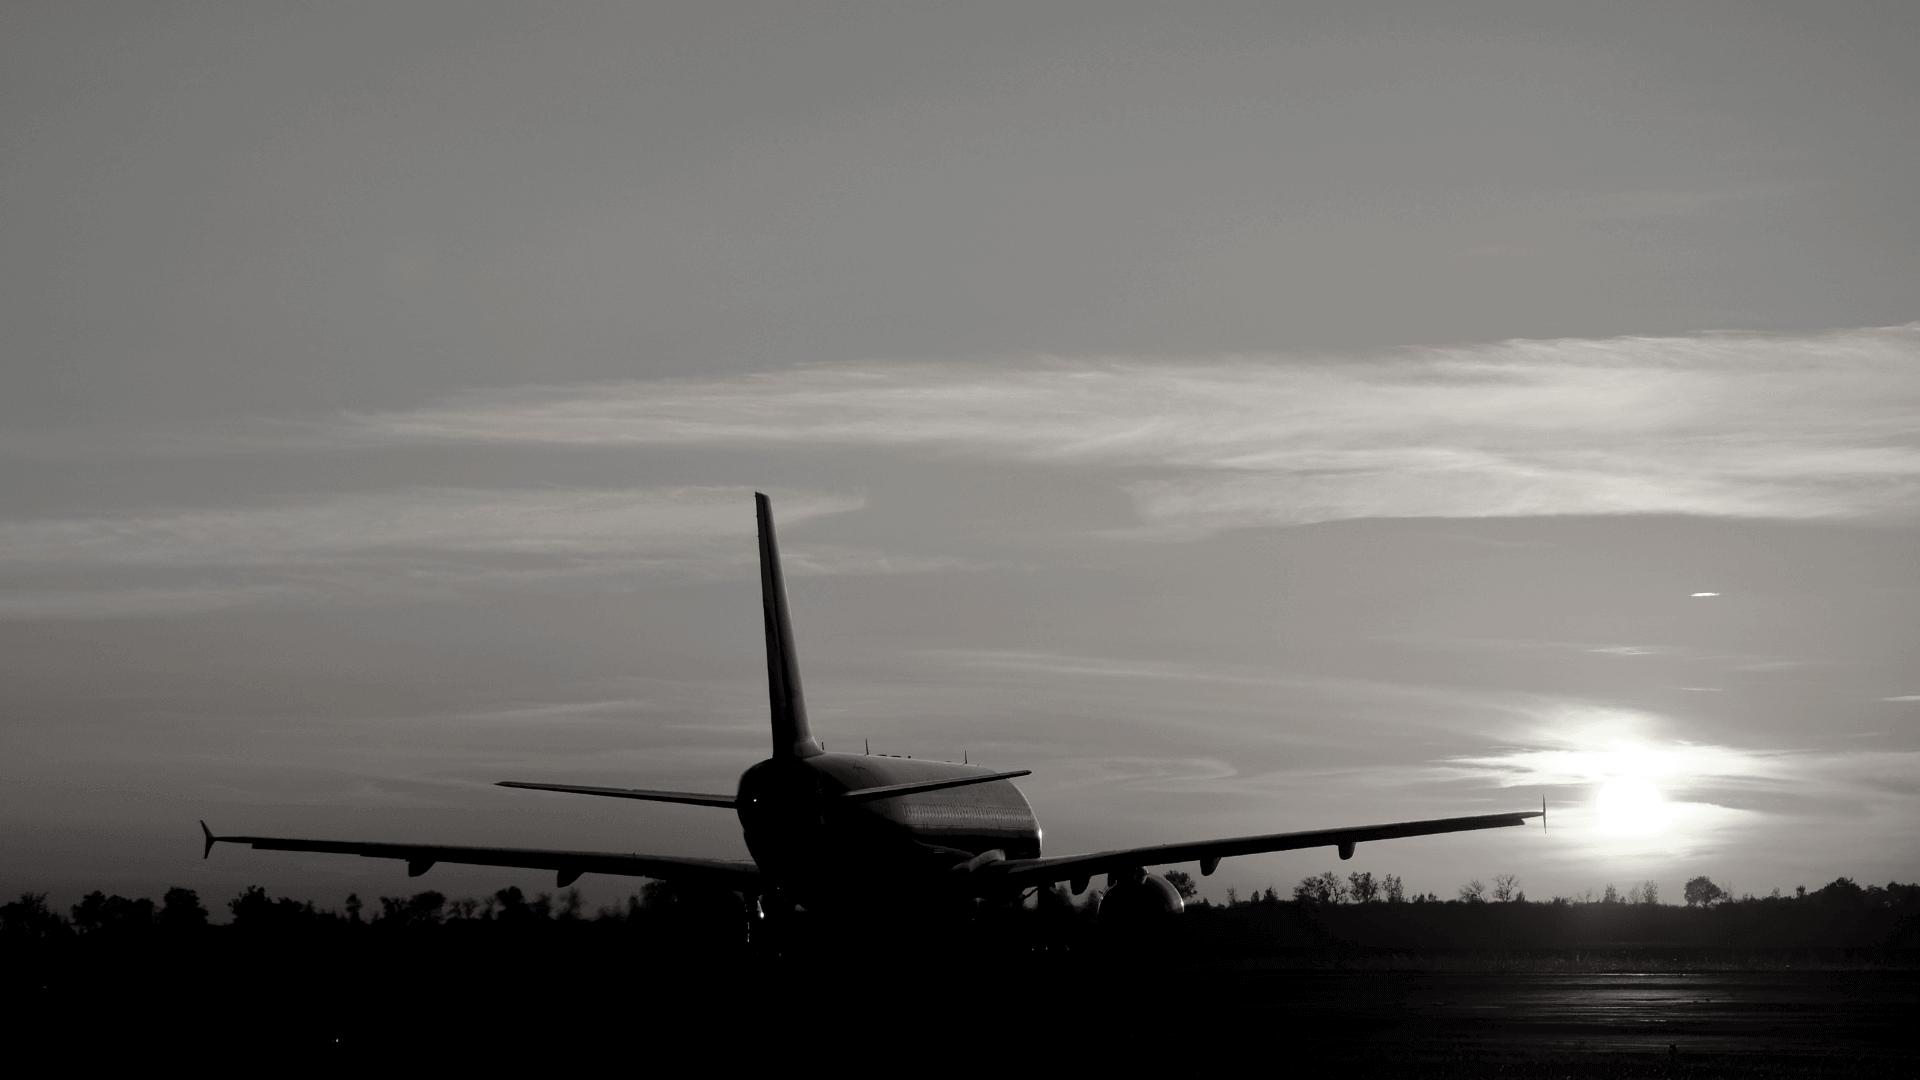 hire-a-car-flugzeug beim Abheben